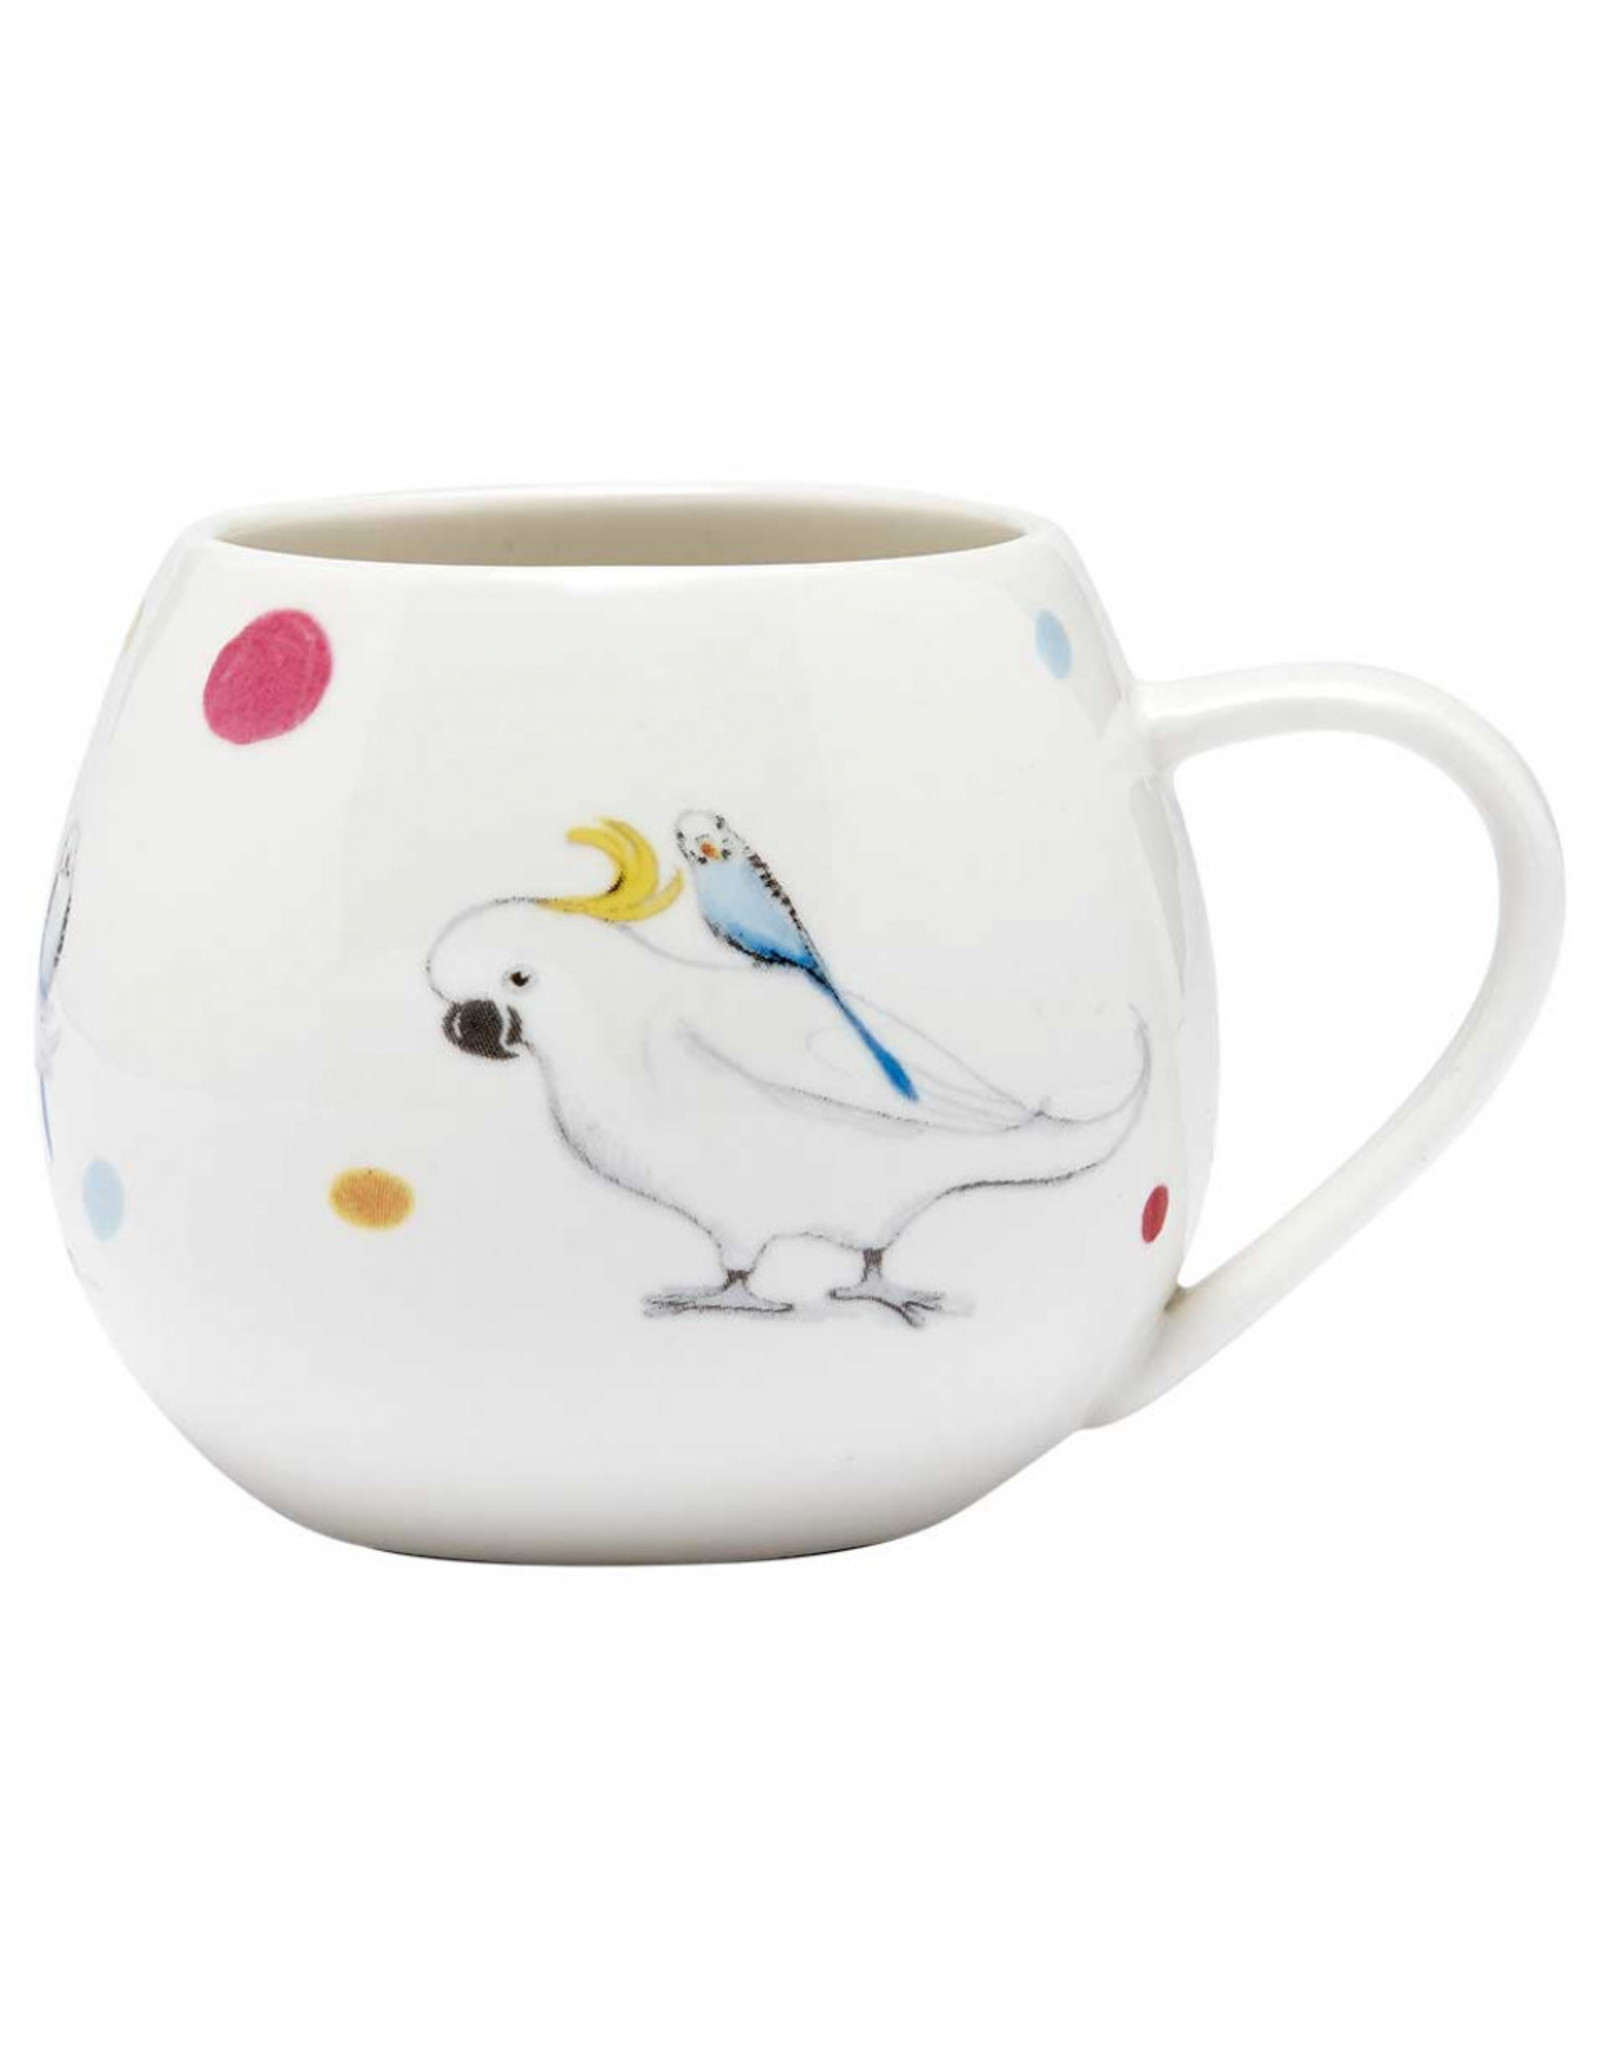 Ashdene Barney Gumnut & Friends Cockatoo Mug